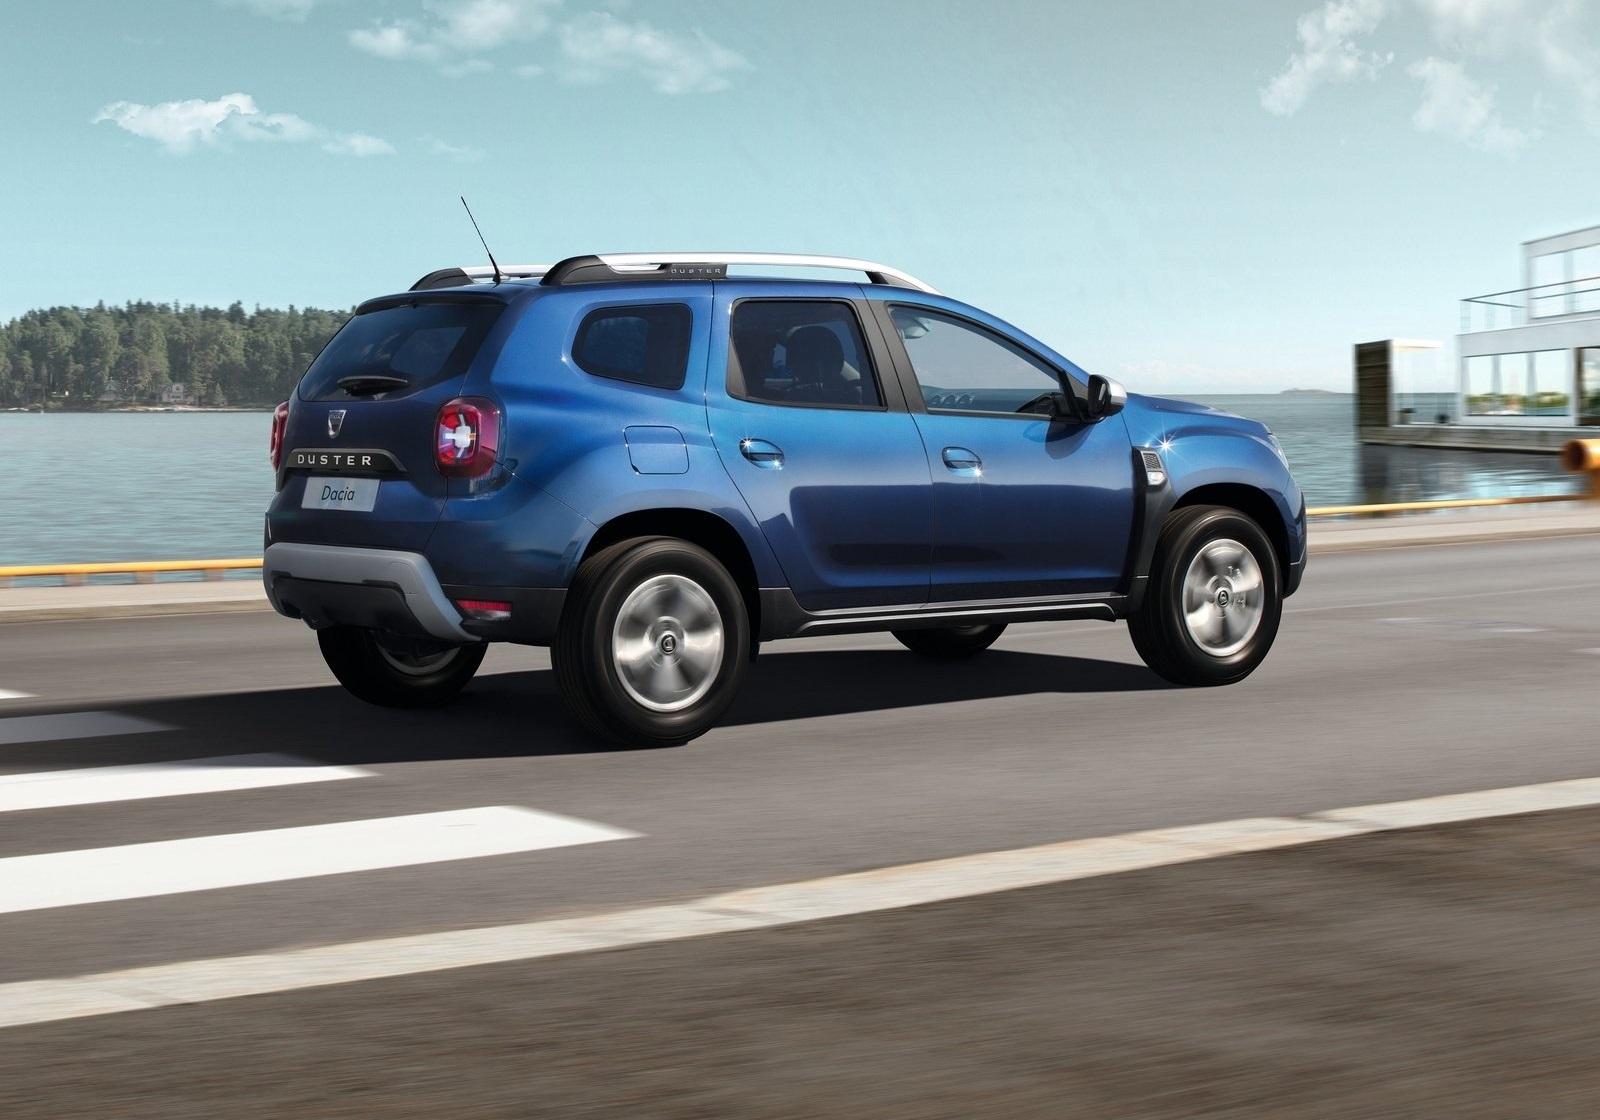 Dacia Duster Glp (4)